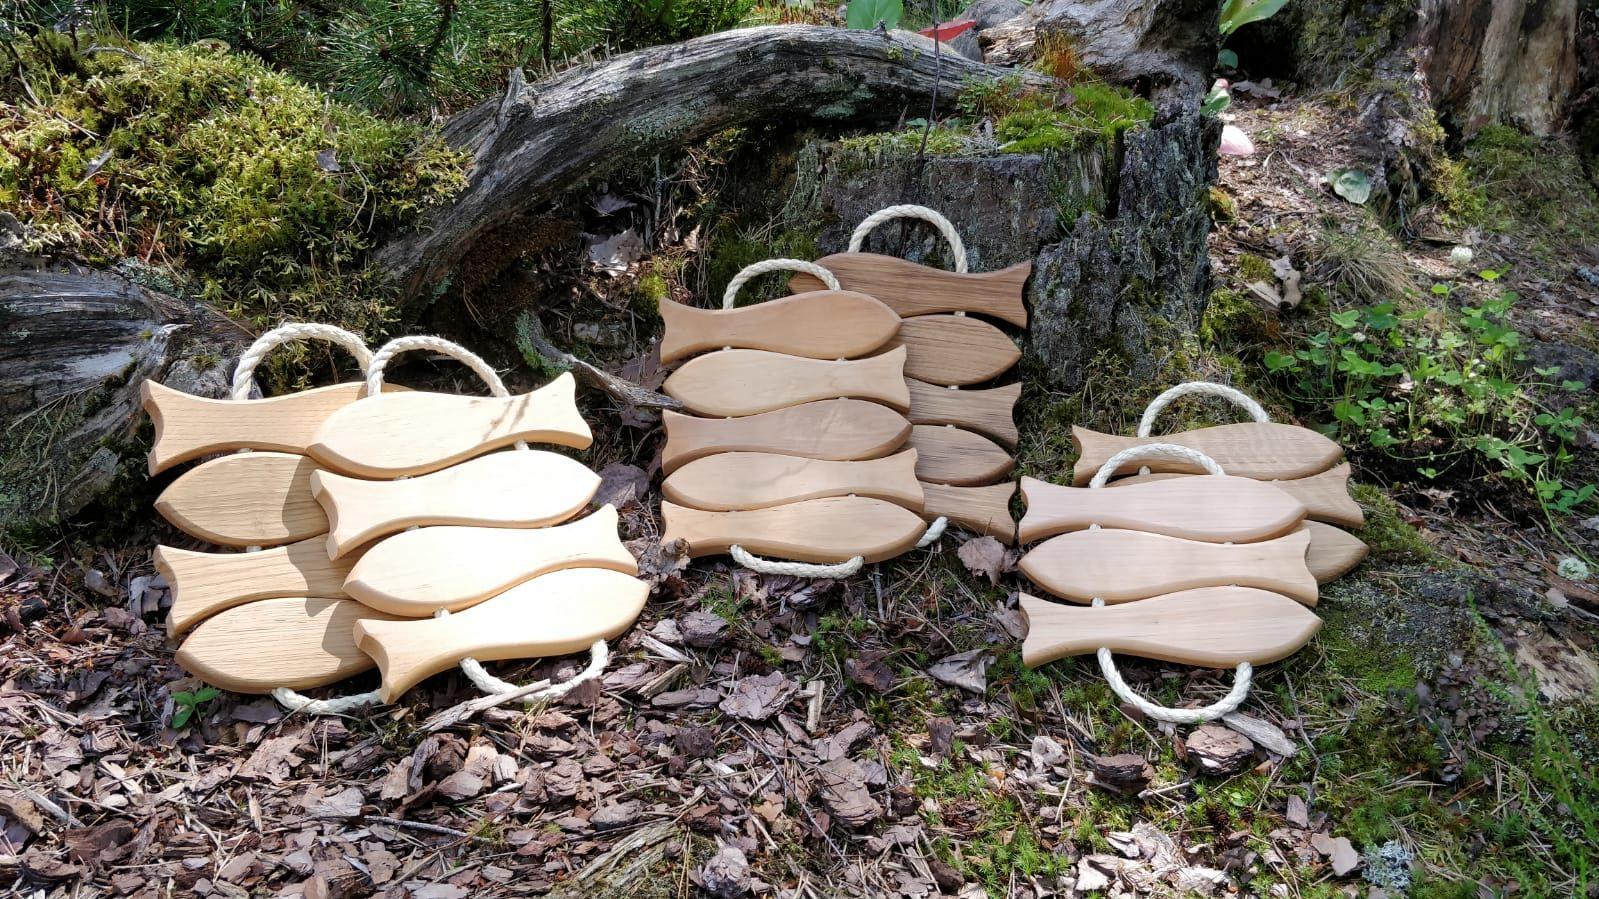 Pot coasters and trivets